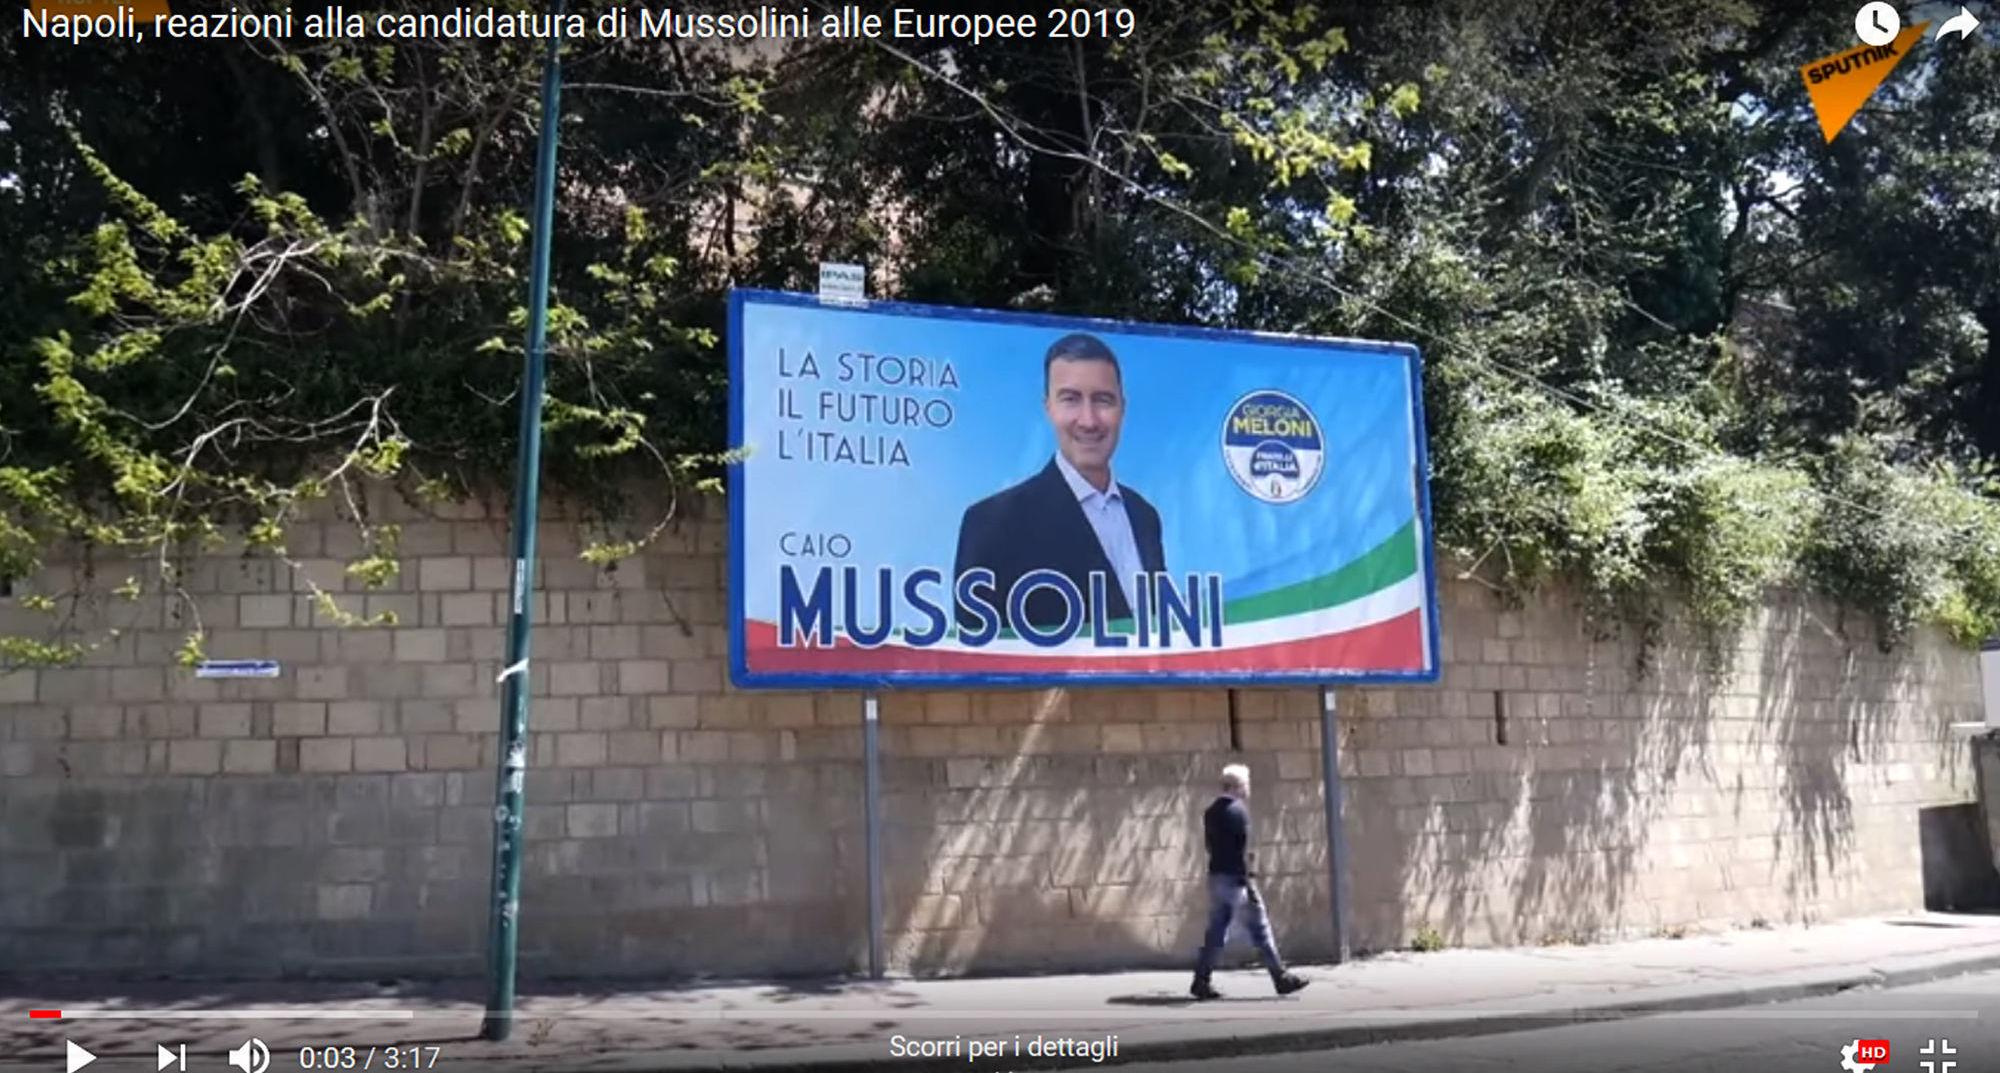 Fratelli d'Italia candida Mussolini